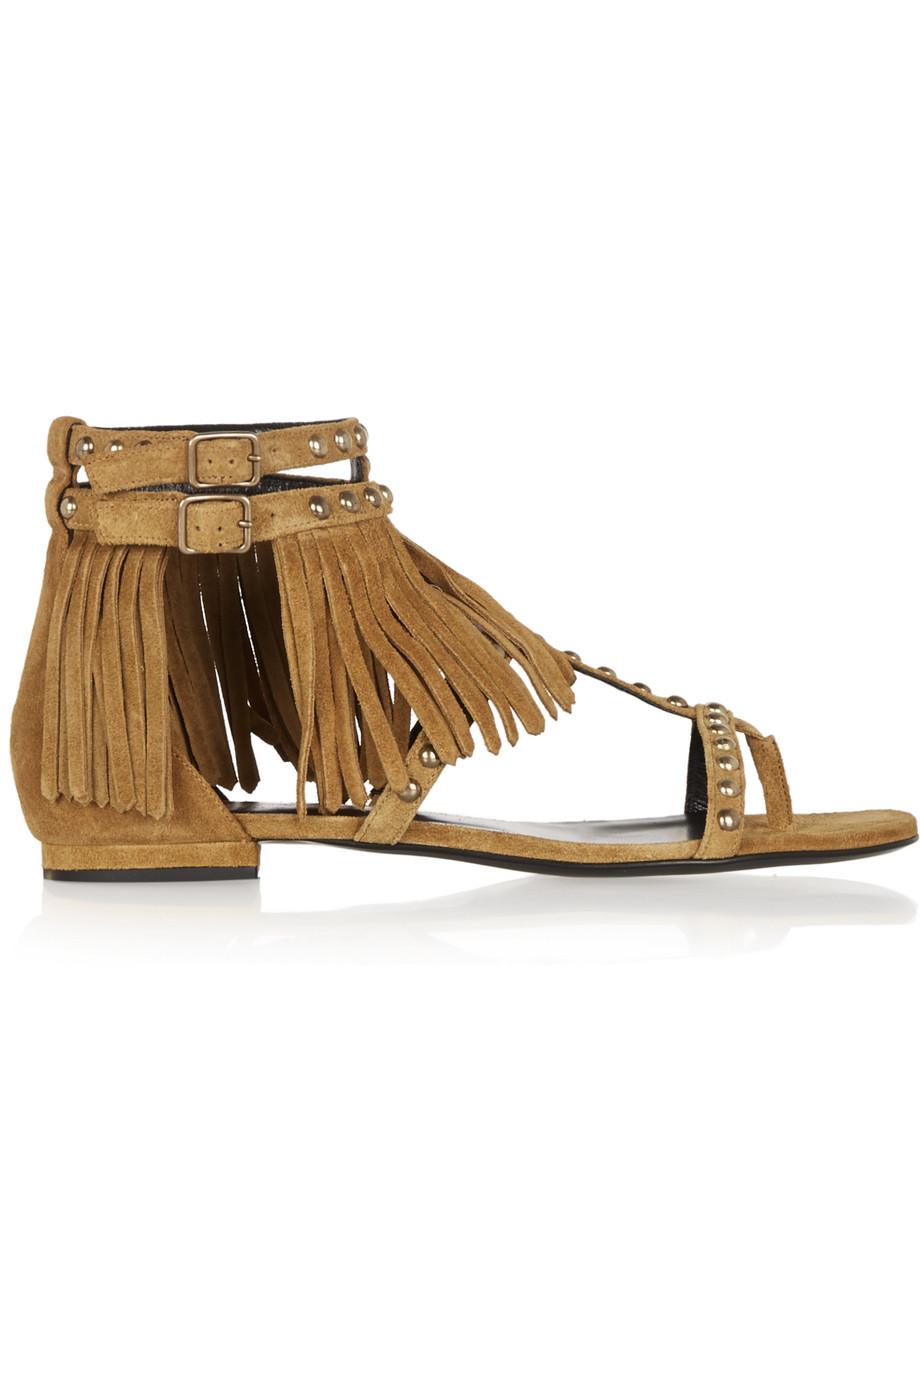 b2c5190f55fa Saint Laurent Studded Fringed Suede Sandals